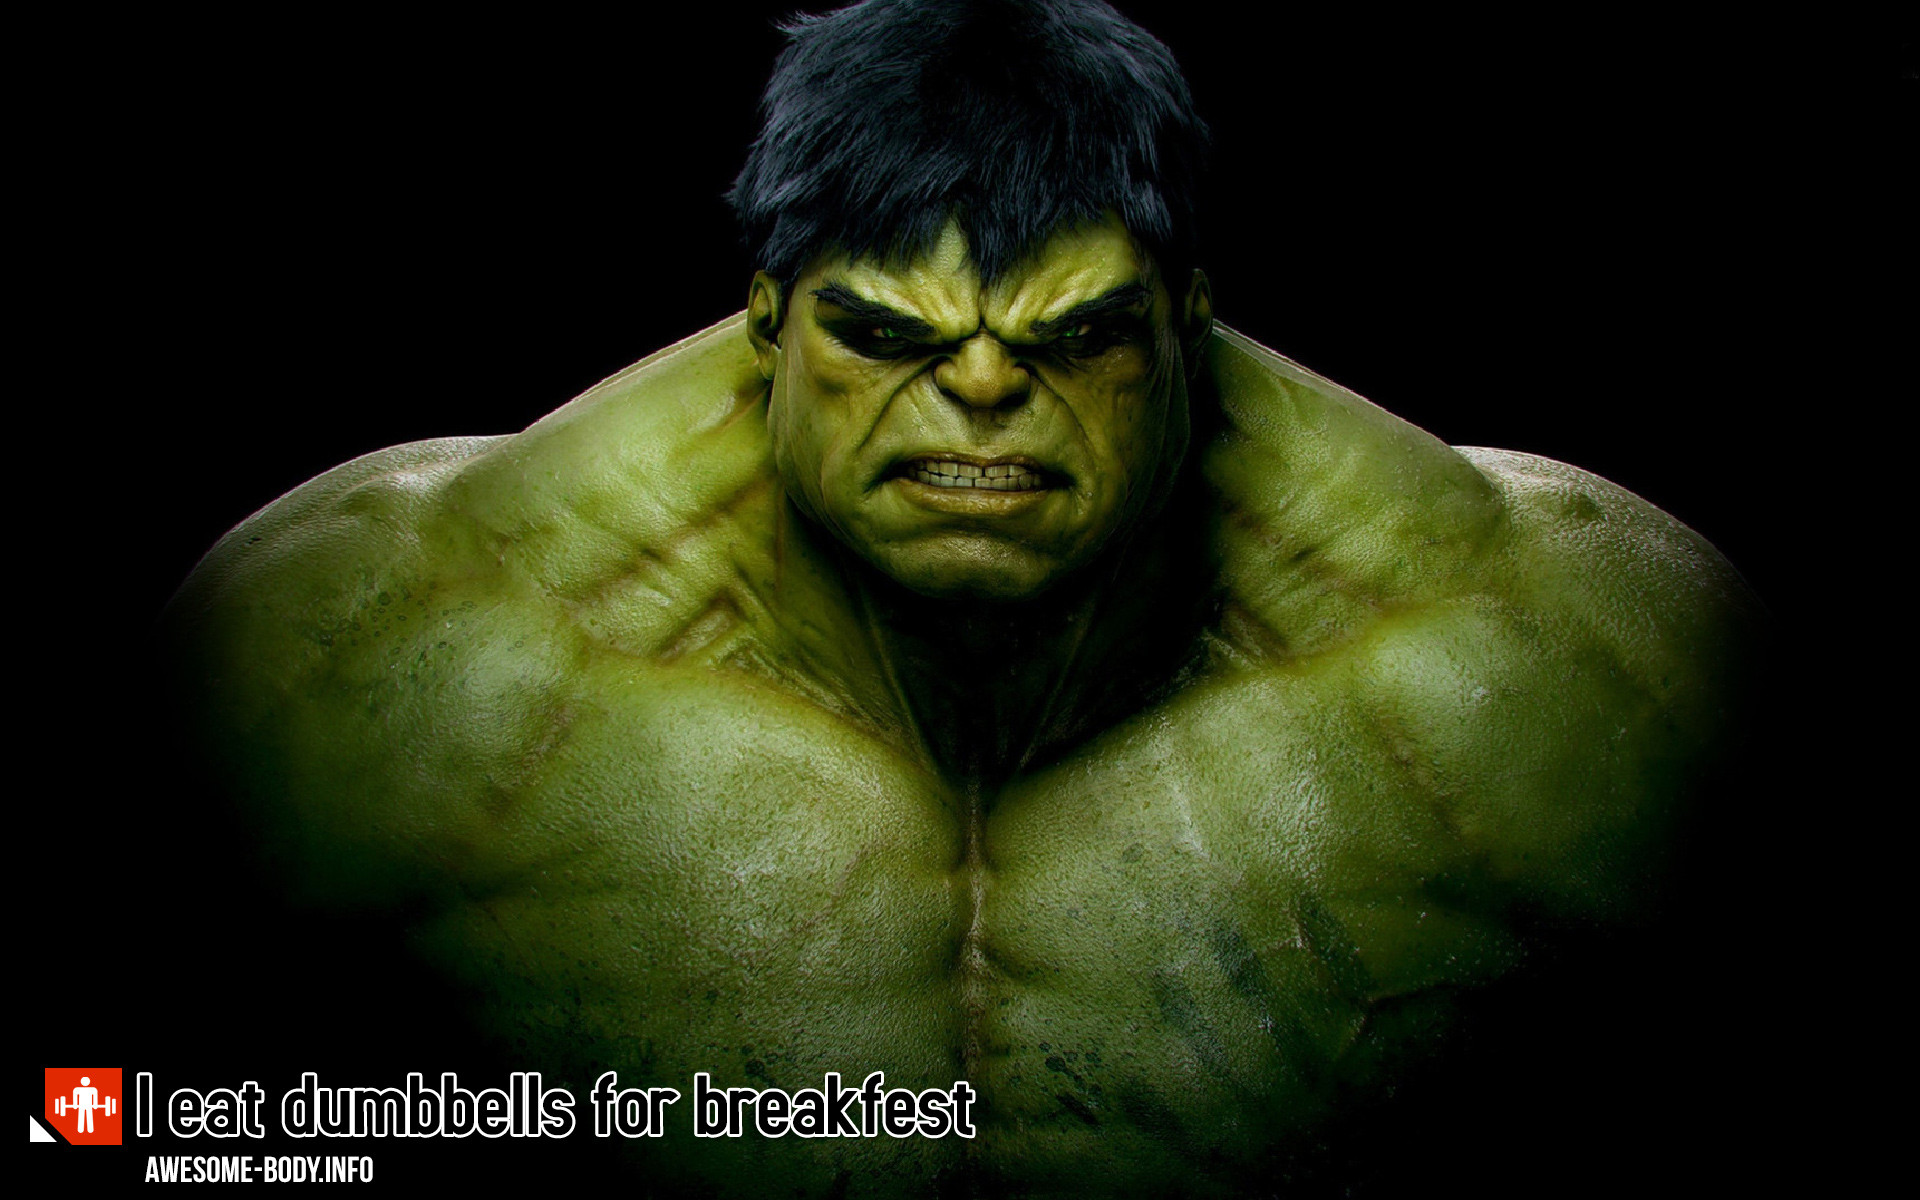 Hulk wallpaper Beast Motivation HD Poster Awesome Hulk 1920x1200